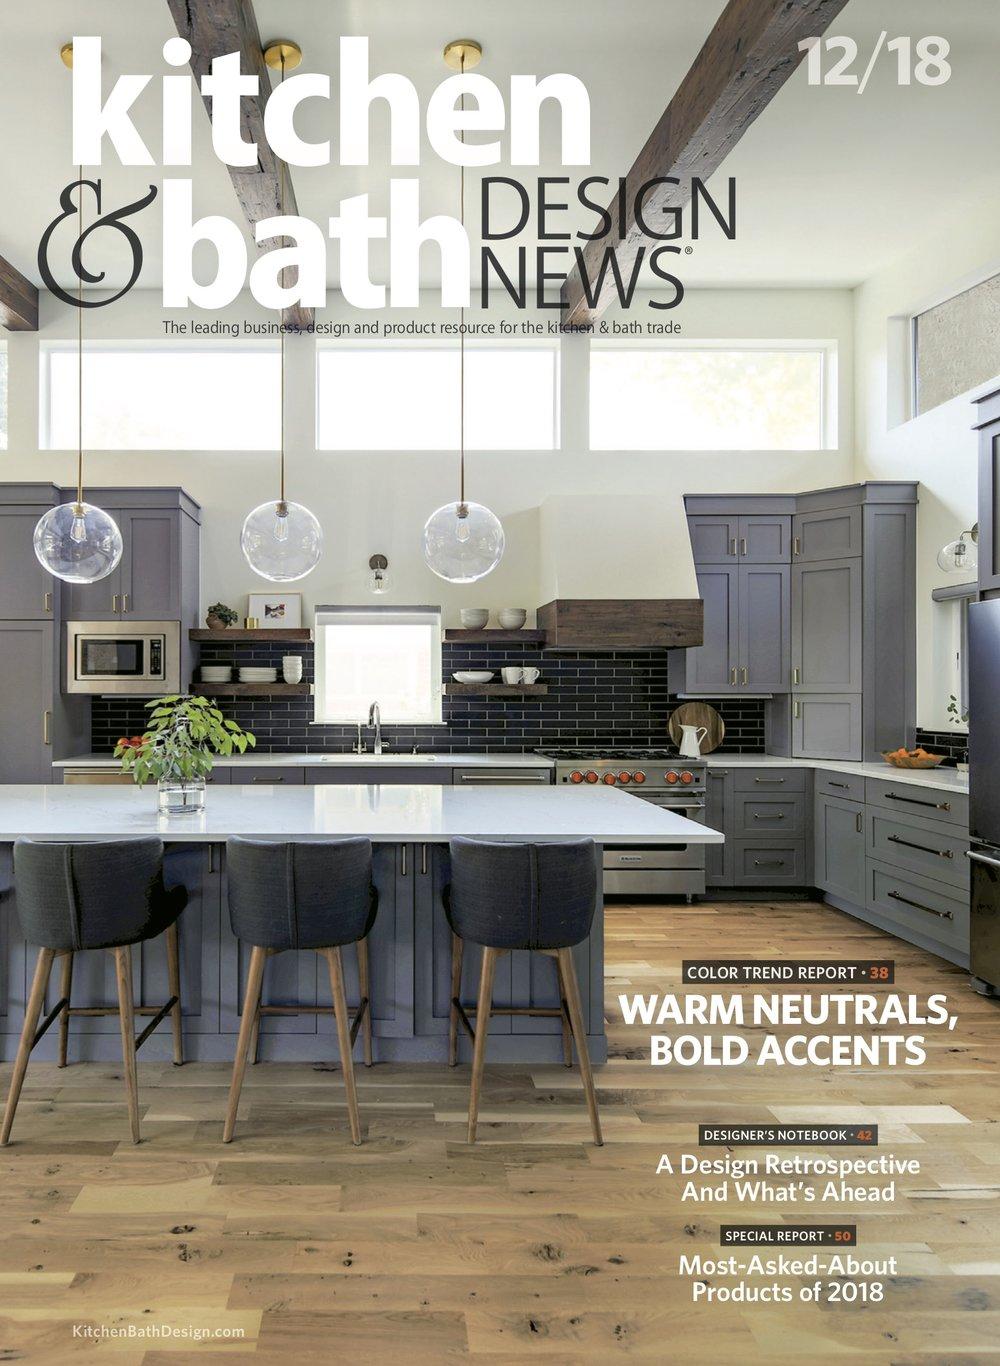 Kitchen and Bath Design News, December 2018 - Warming Trends